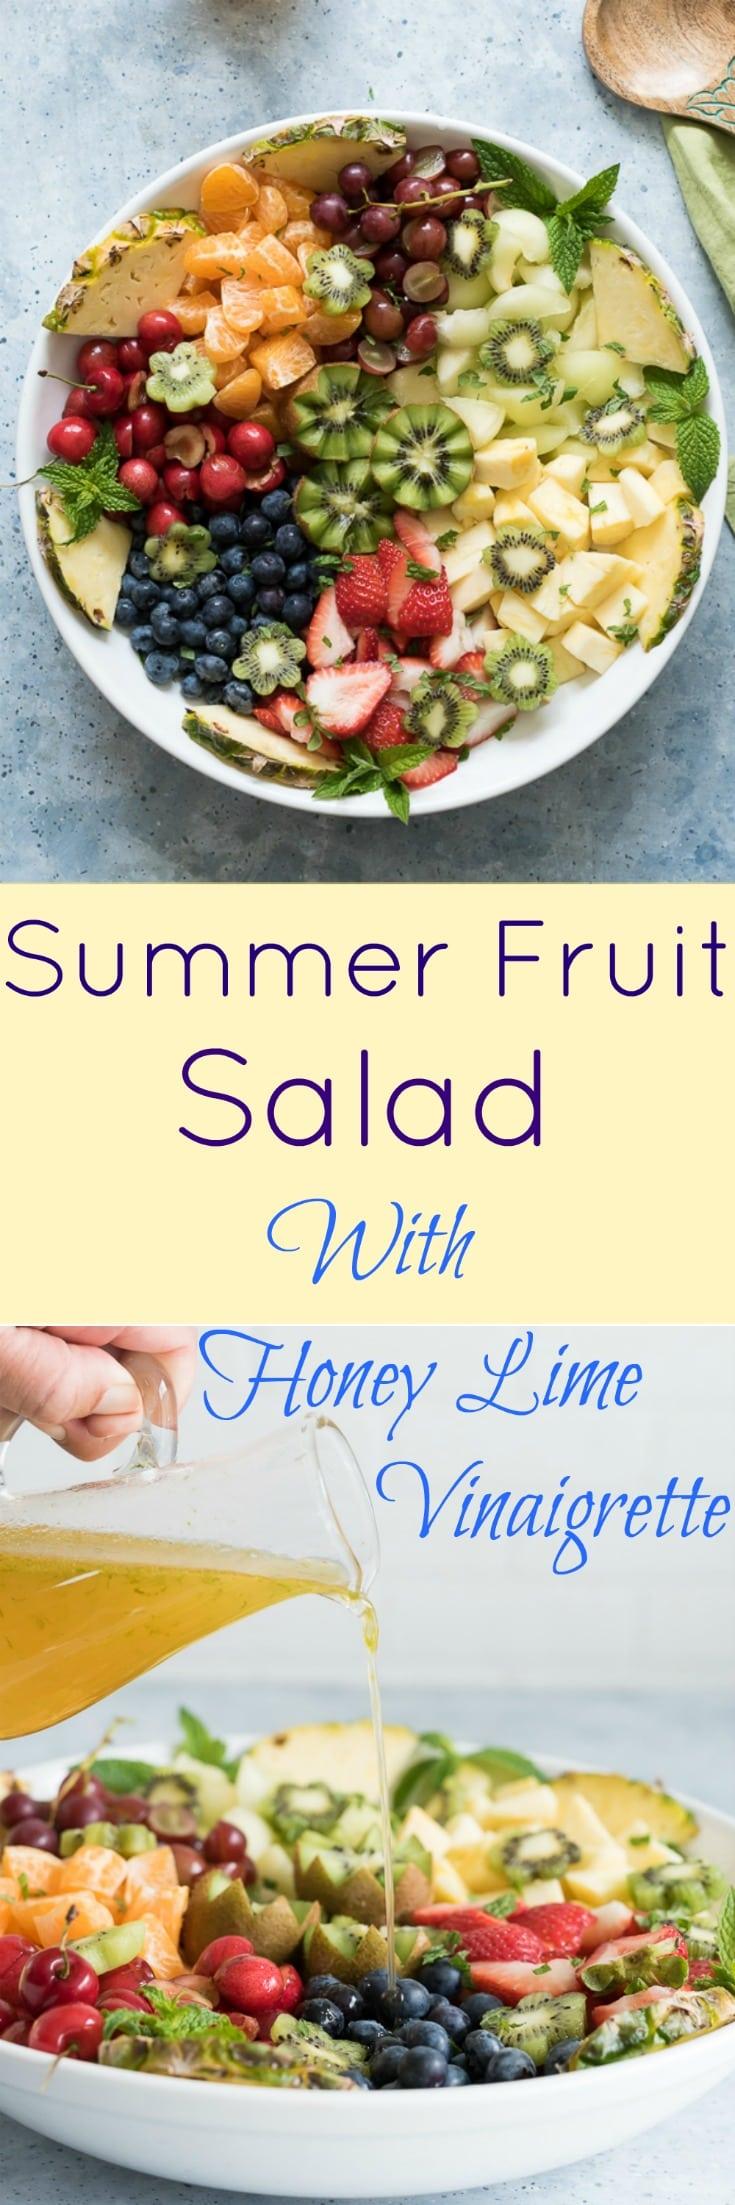 Summer Fruit Salad with Honey Lime Vinaigrette www.pineappleandcoconut.com #Discoverworldmarket #ad